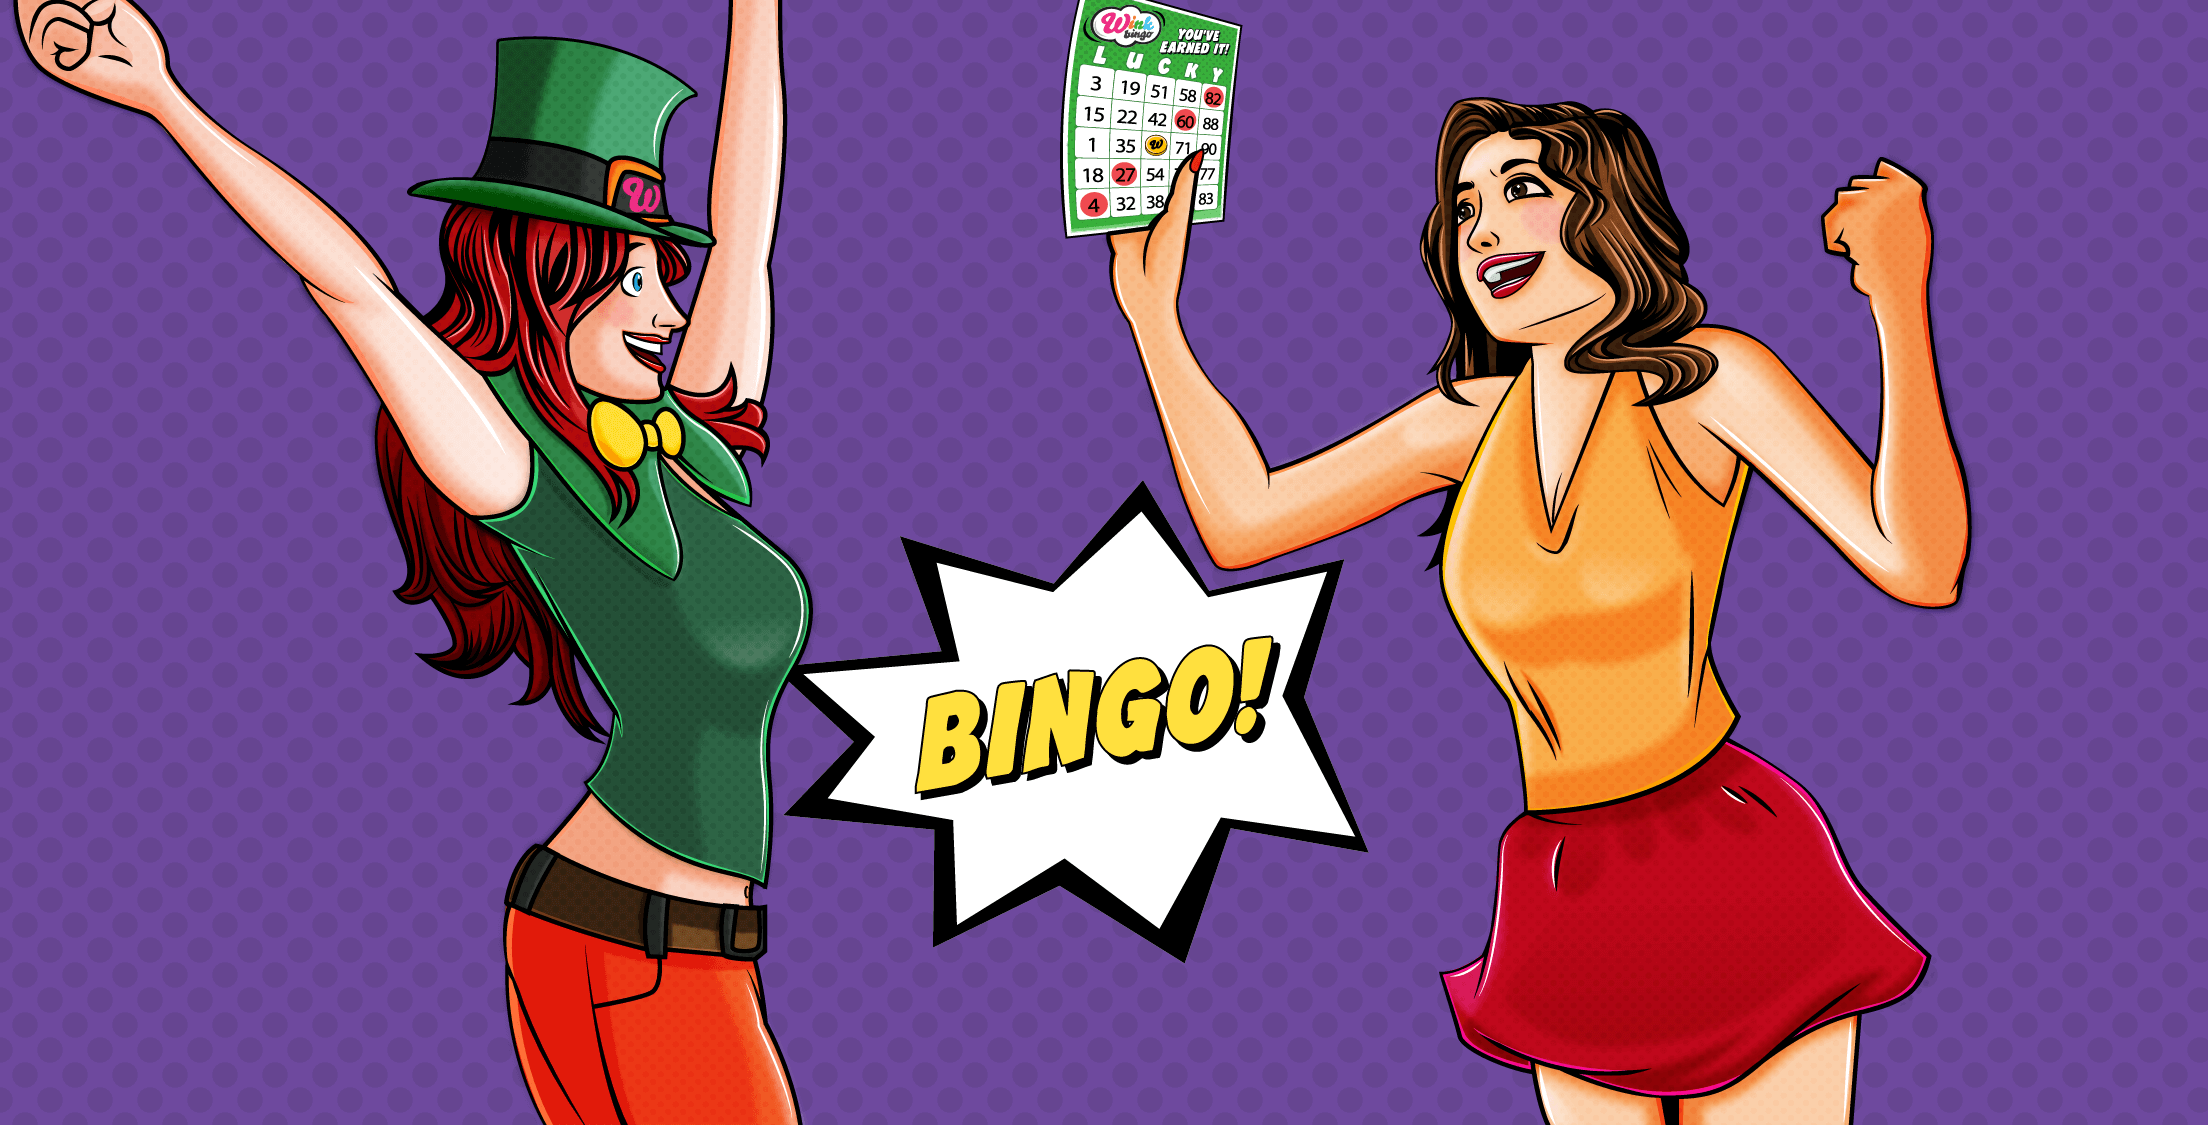 St. Patricks Day Bingo Winner